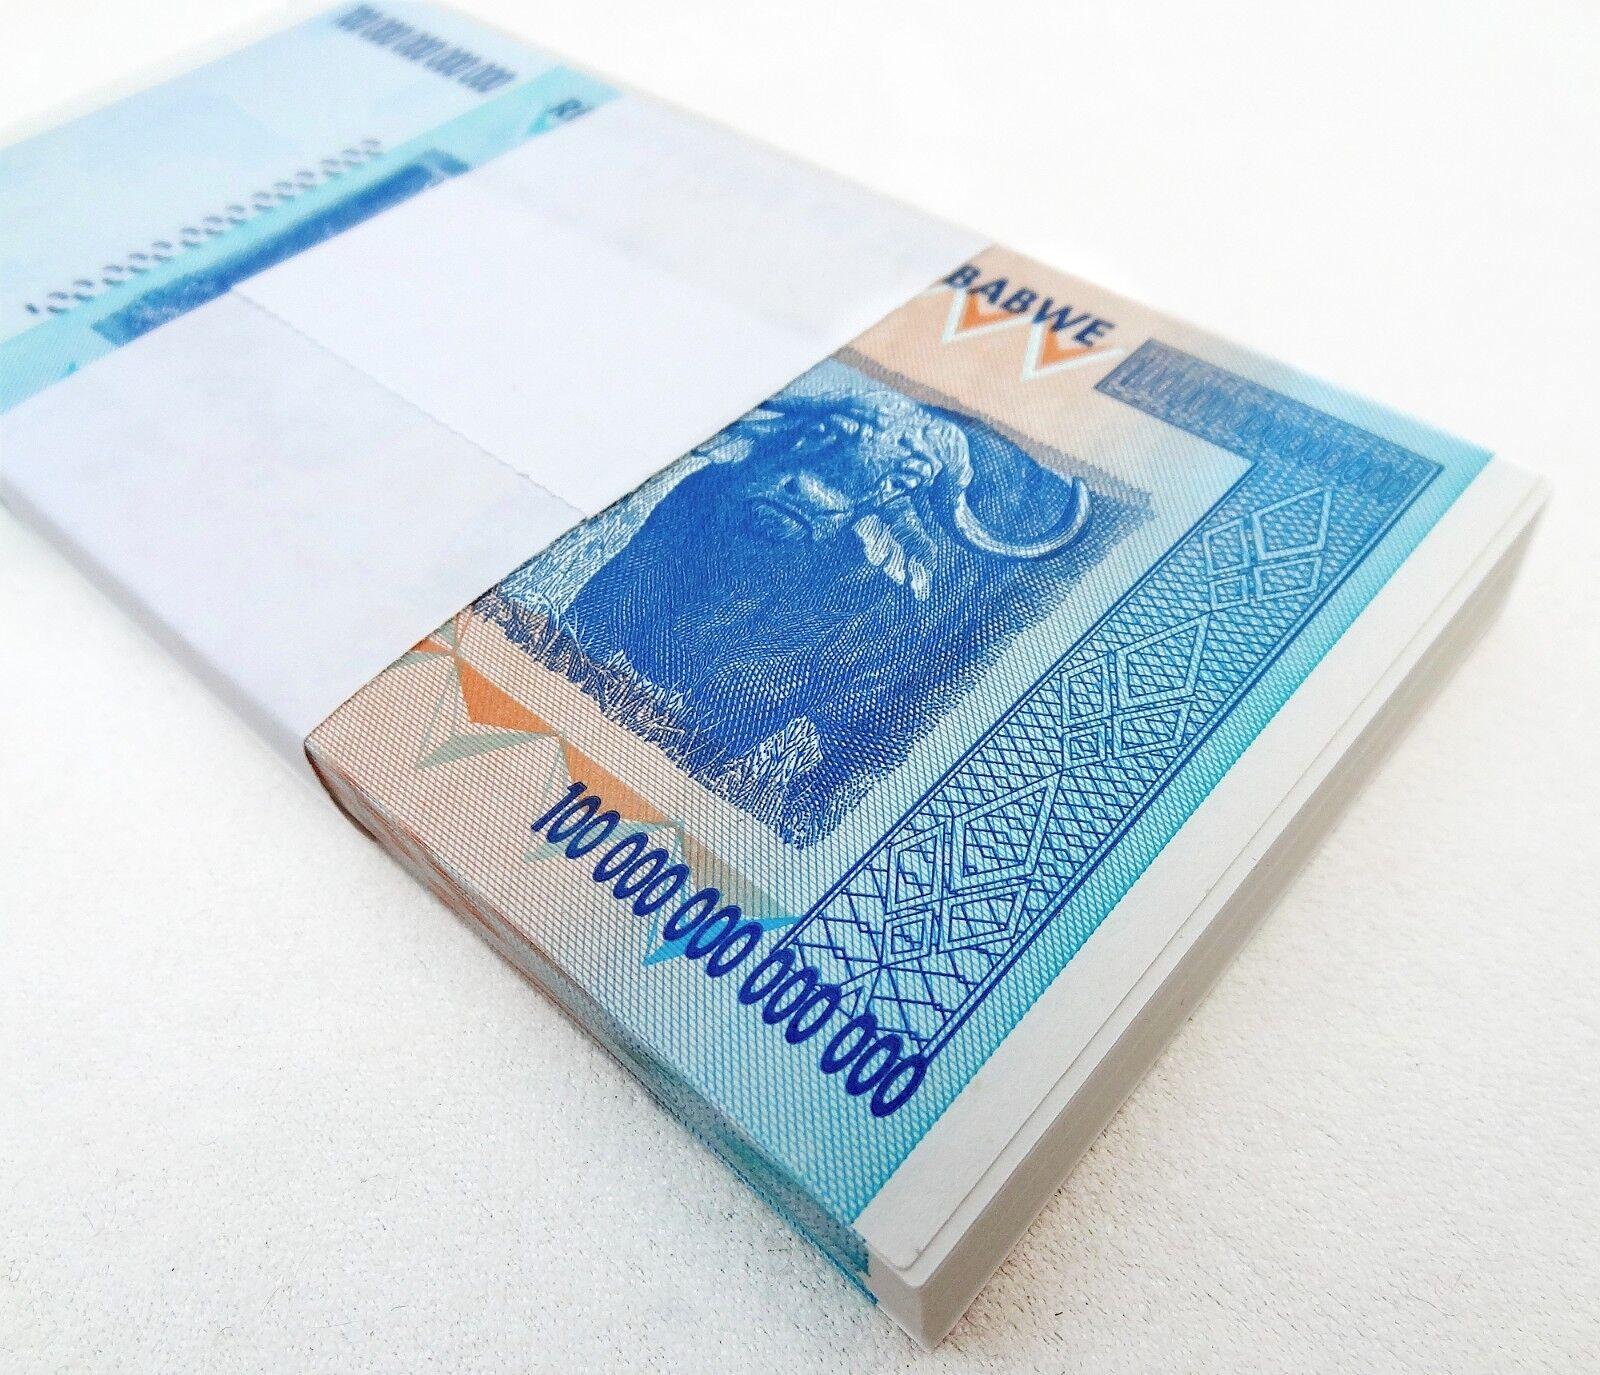 ZIMBABWE 100 TRILLION DOLLARS AA 2008 SERIES P-91 UNC - HALF BUNDLE, 50 NOTES